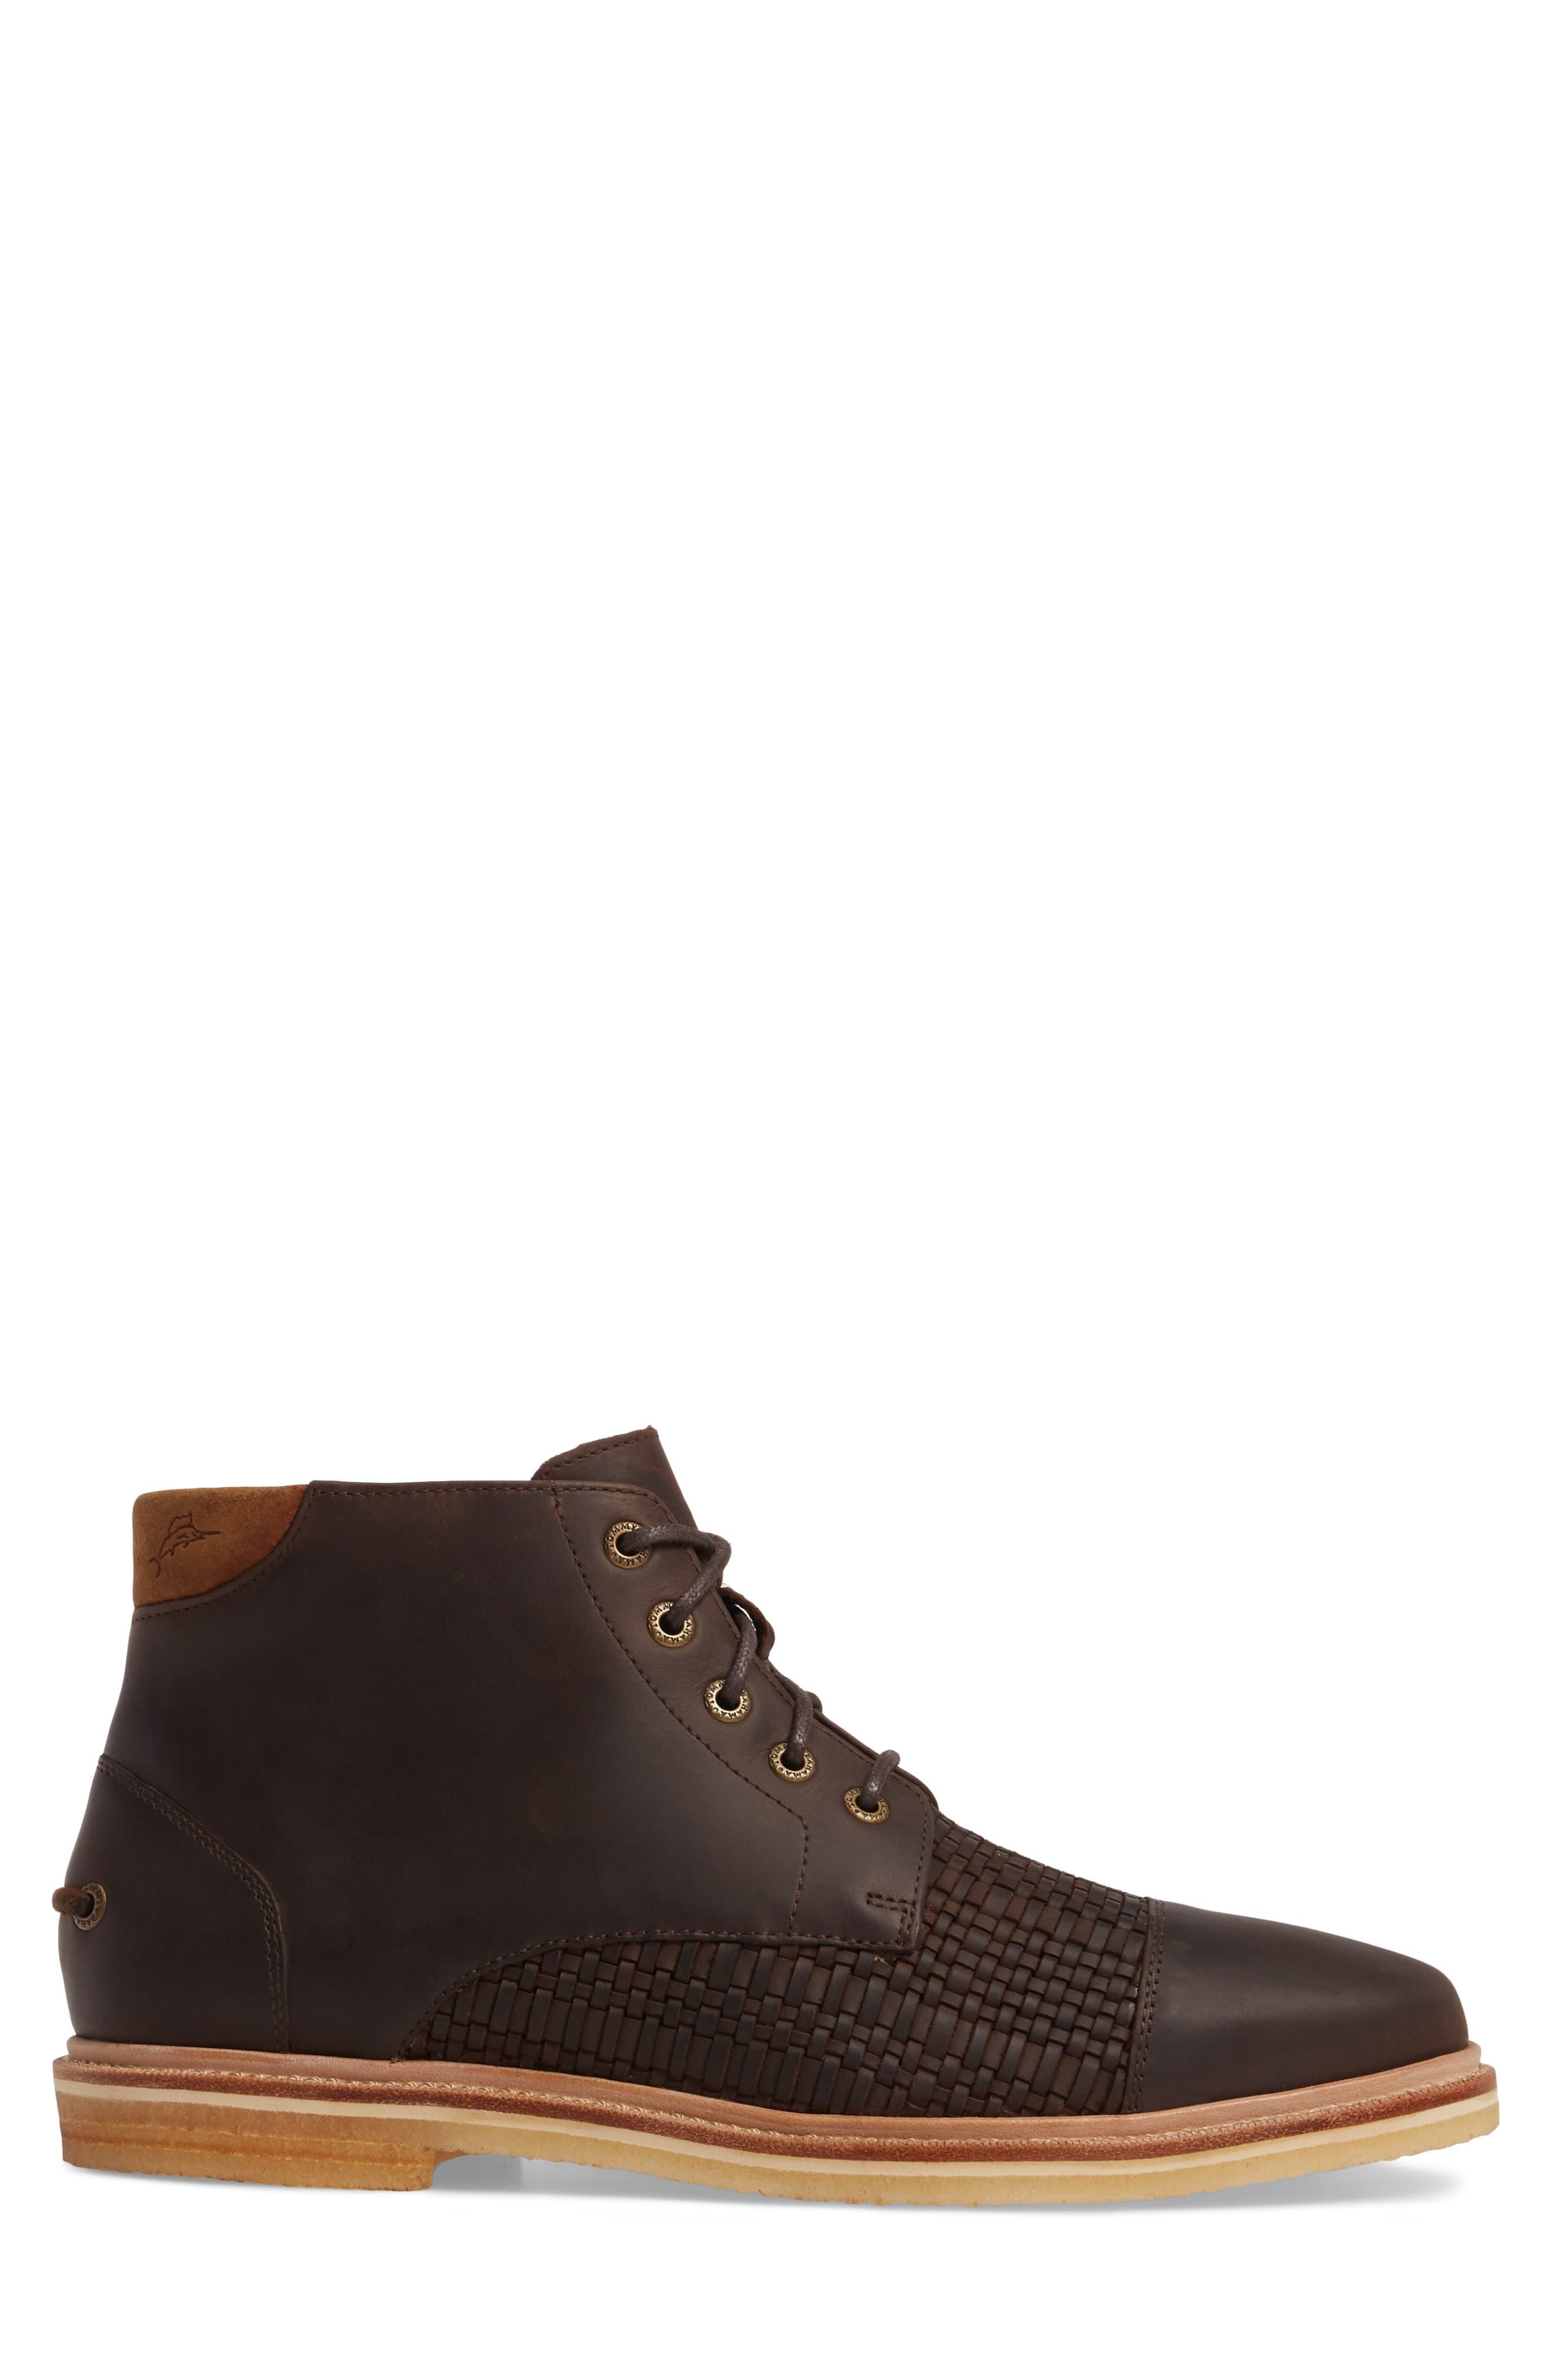 Argon Blooms Cap Toe Boot,                             Alternate thumbnail 3, color,                             Brown Leather